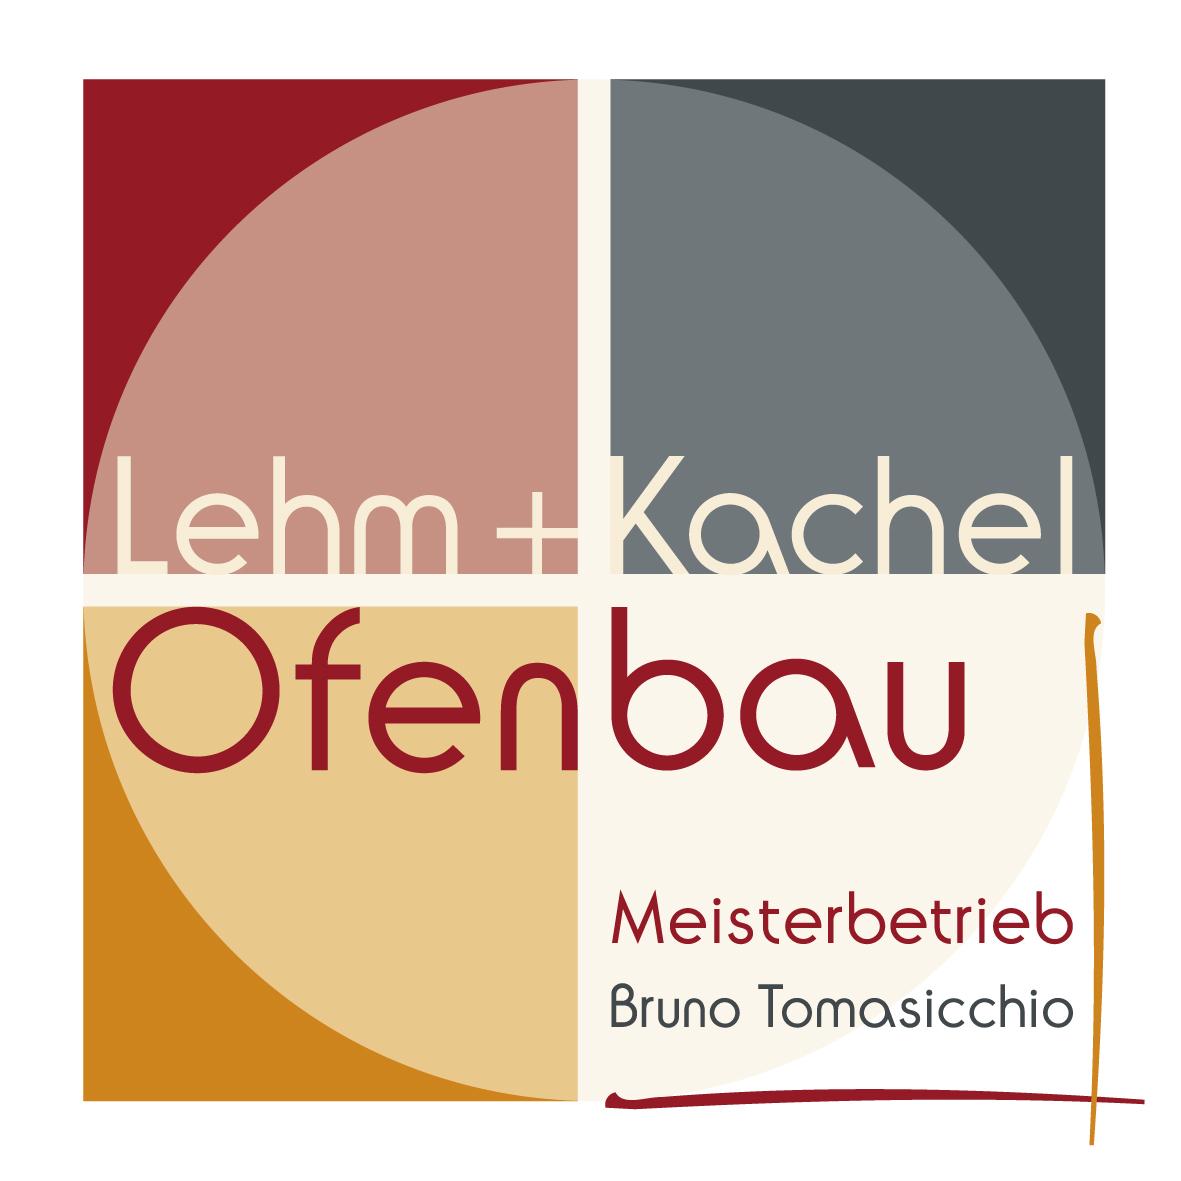 Lehm + Kachel Ofenbau Meisterbetrieb Bruno Tomasicchio